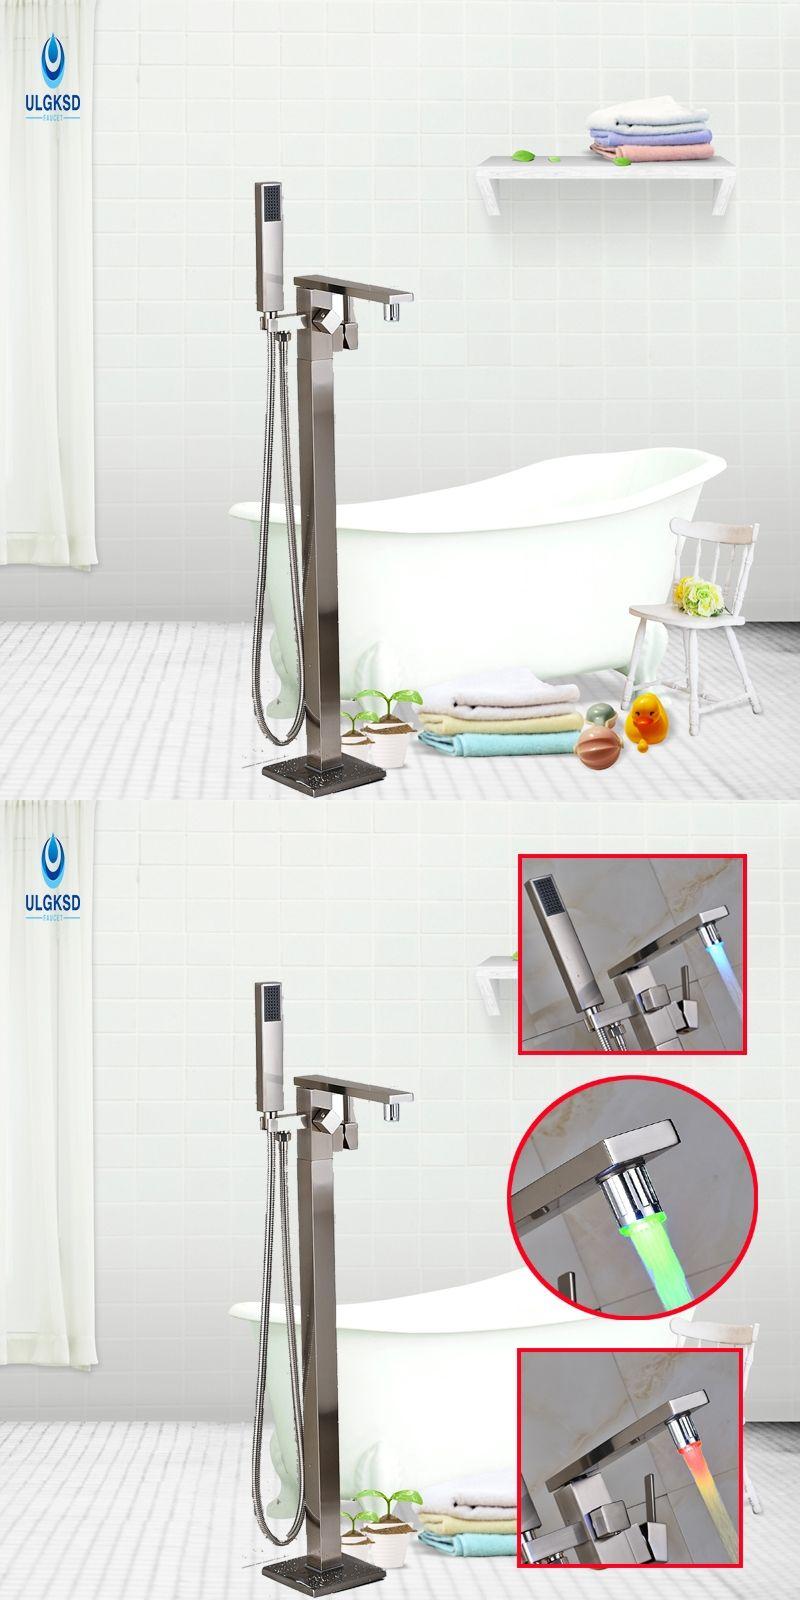 Ulgksd LED Change Bath Floor Standing Shower Faucet W/Hand Shower ...